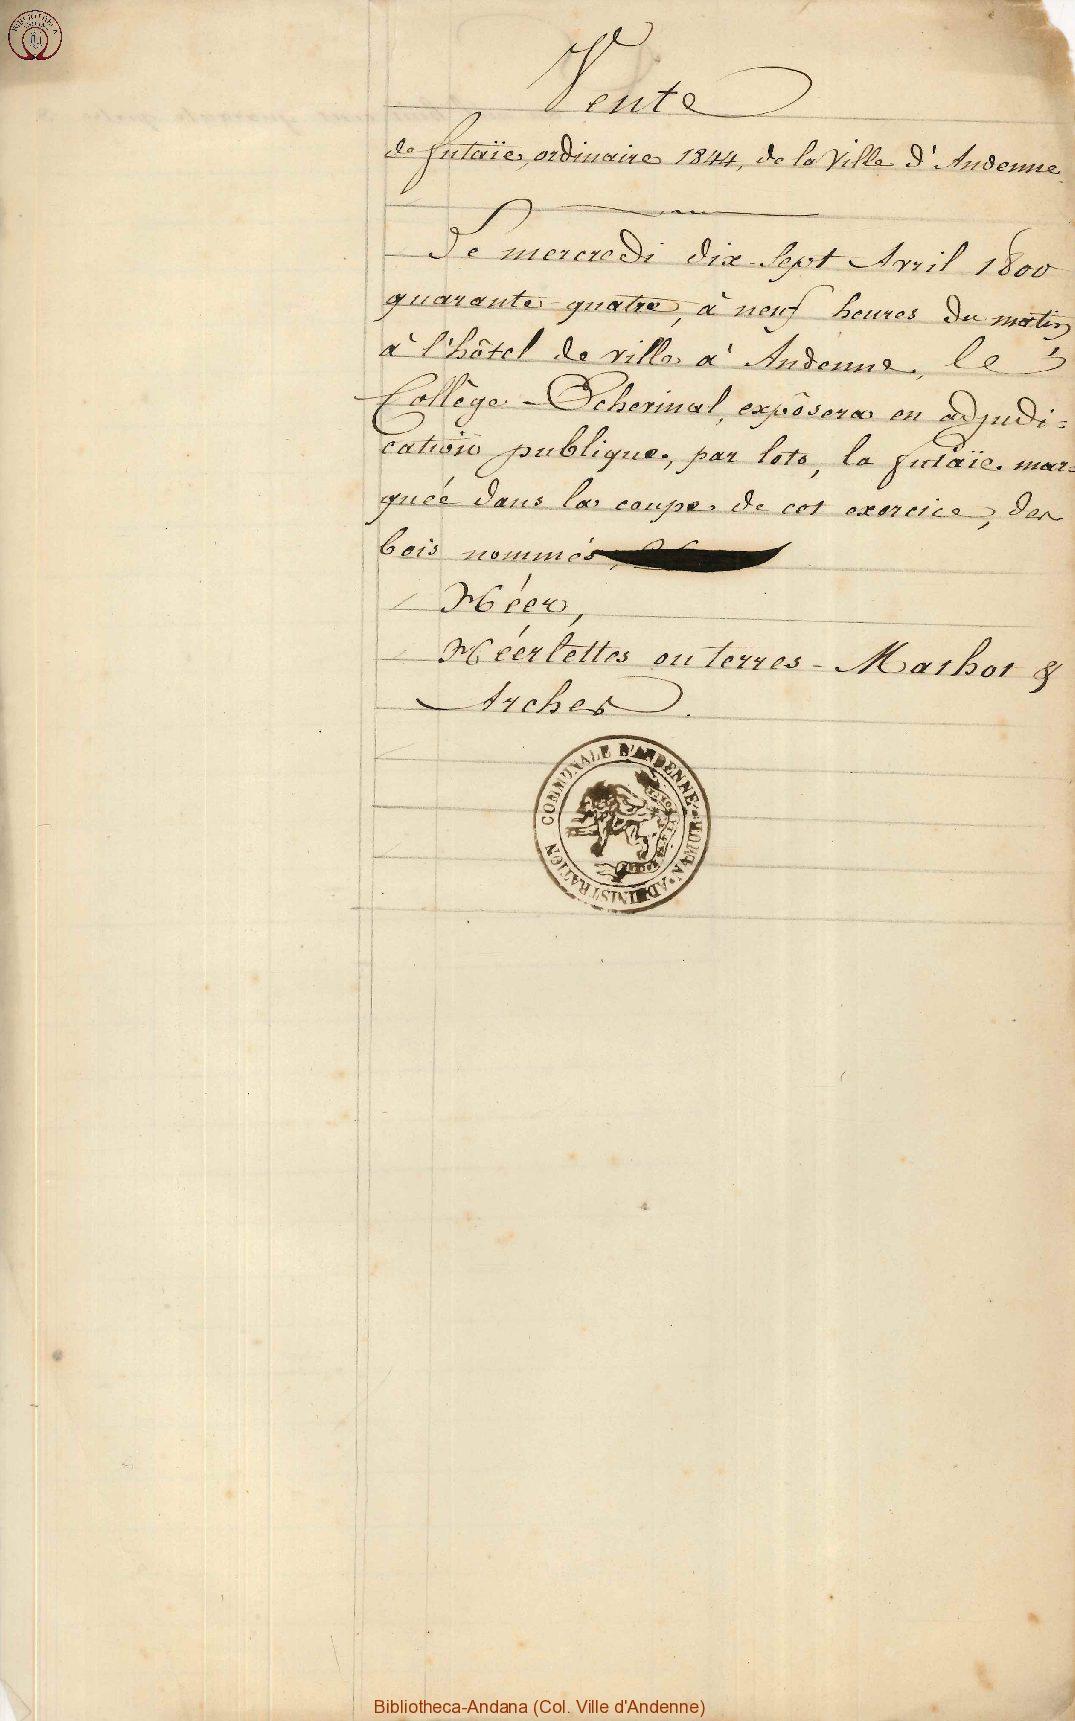 1844-04-17